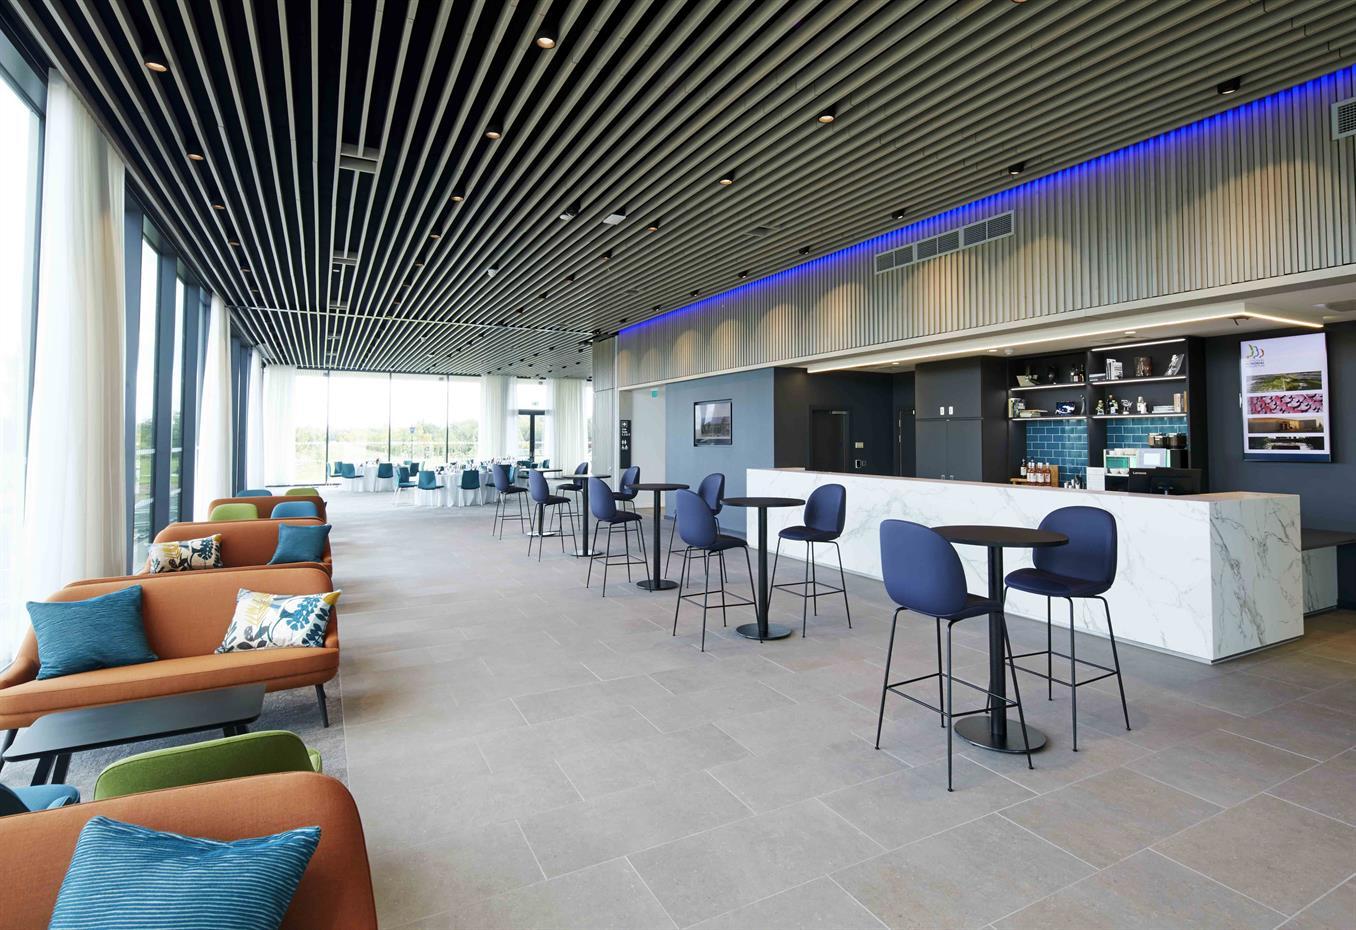 Aspects Lounge Shared Use